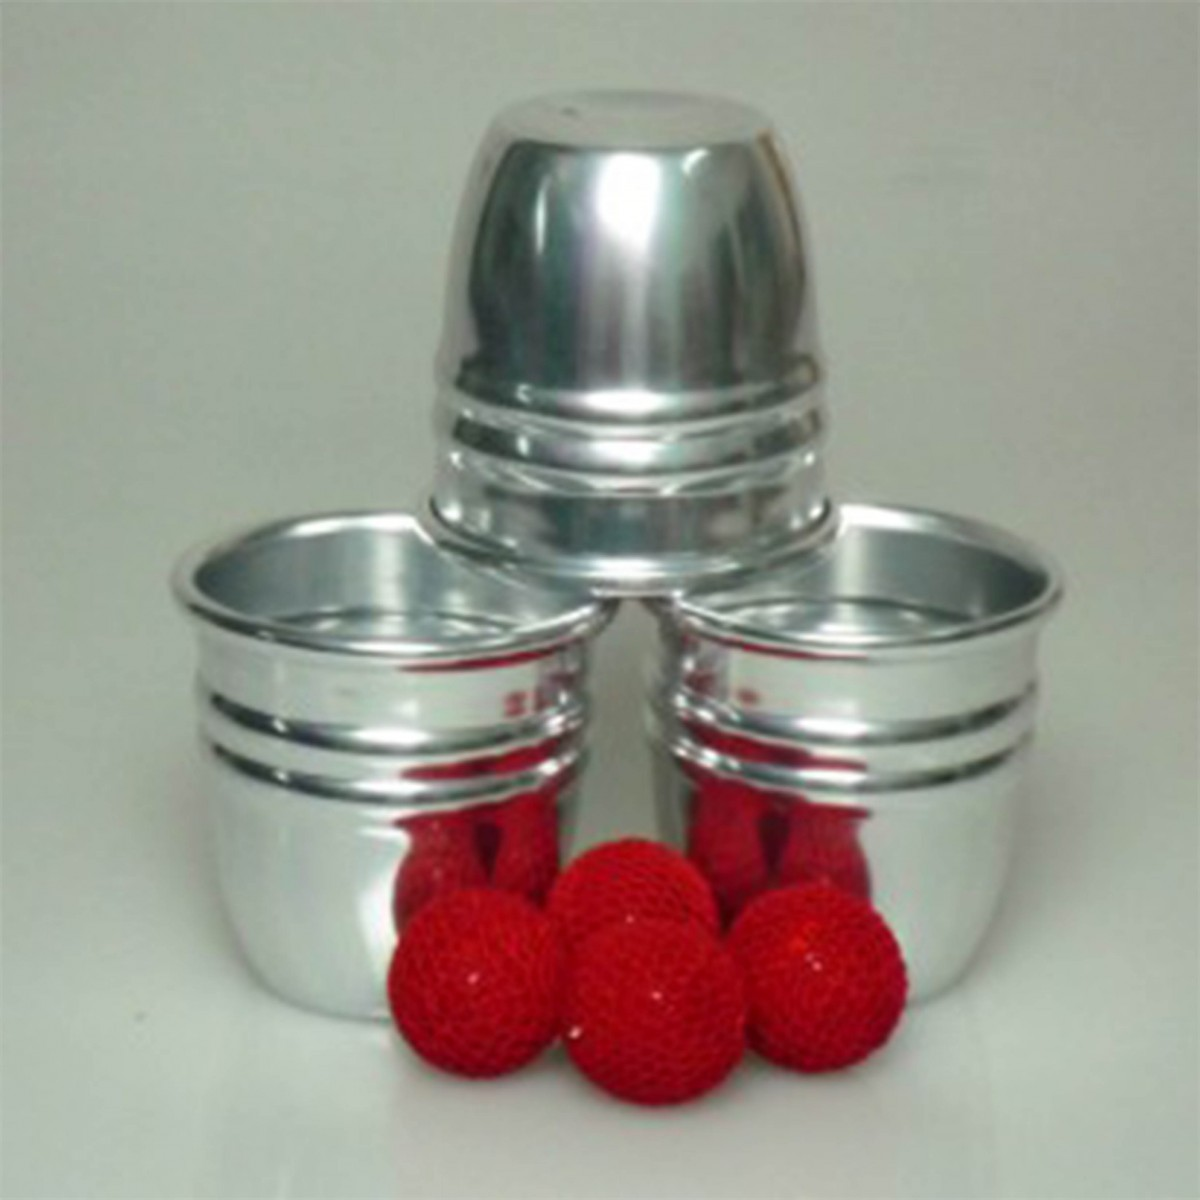 Cups & Balls + Chop Cups - 2 In 1